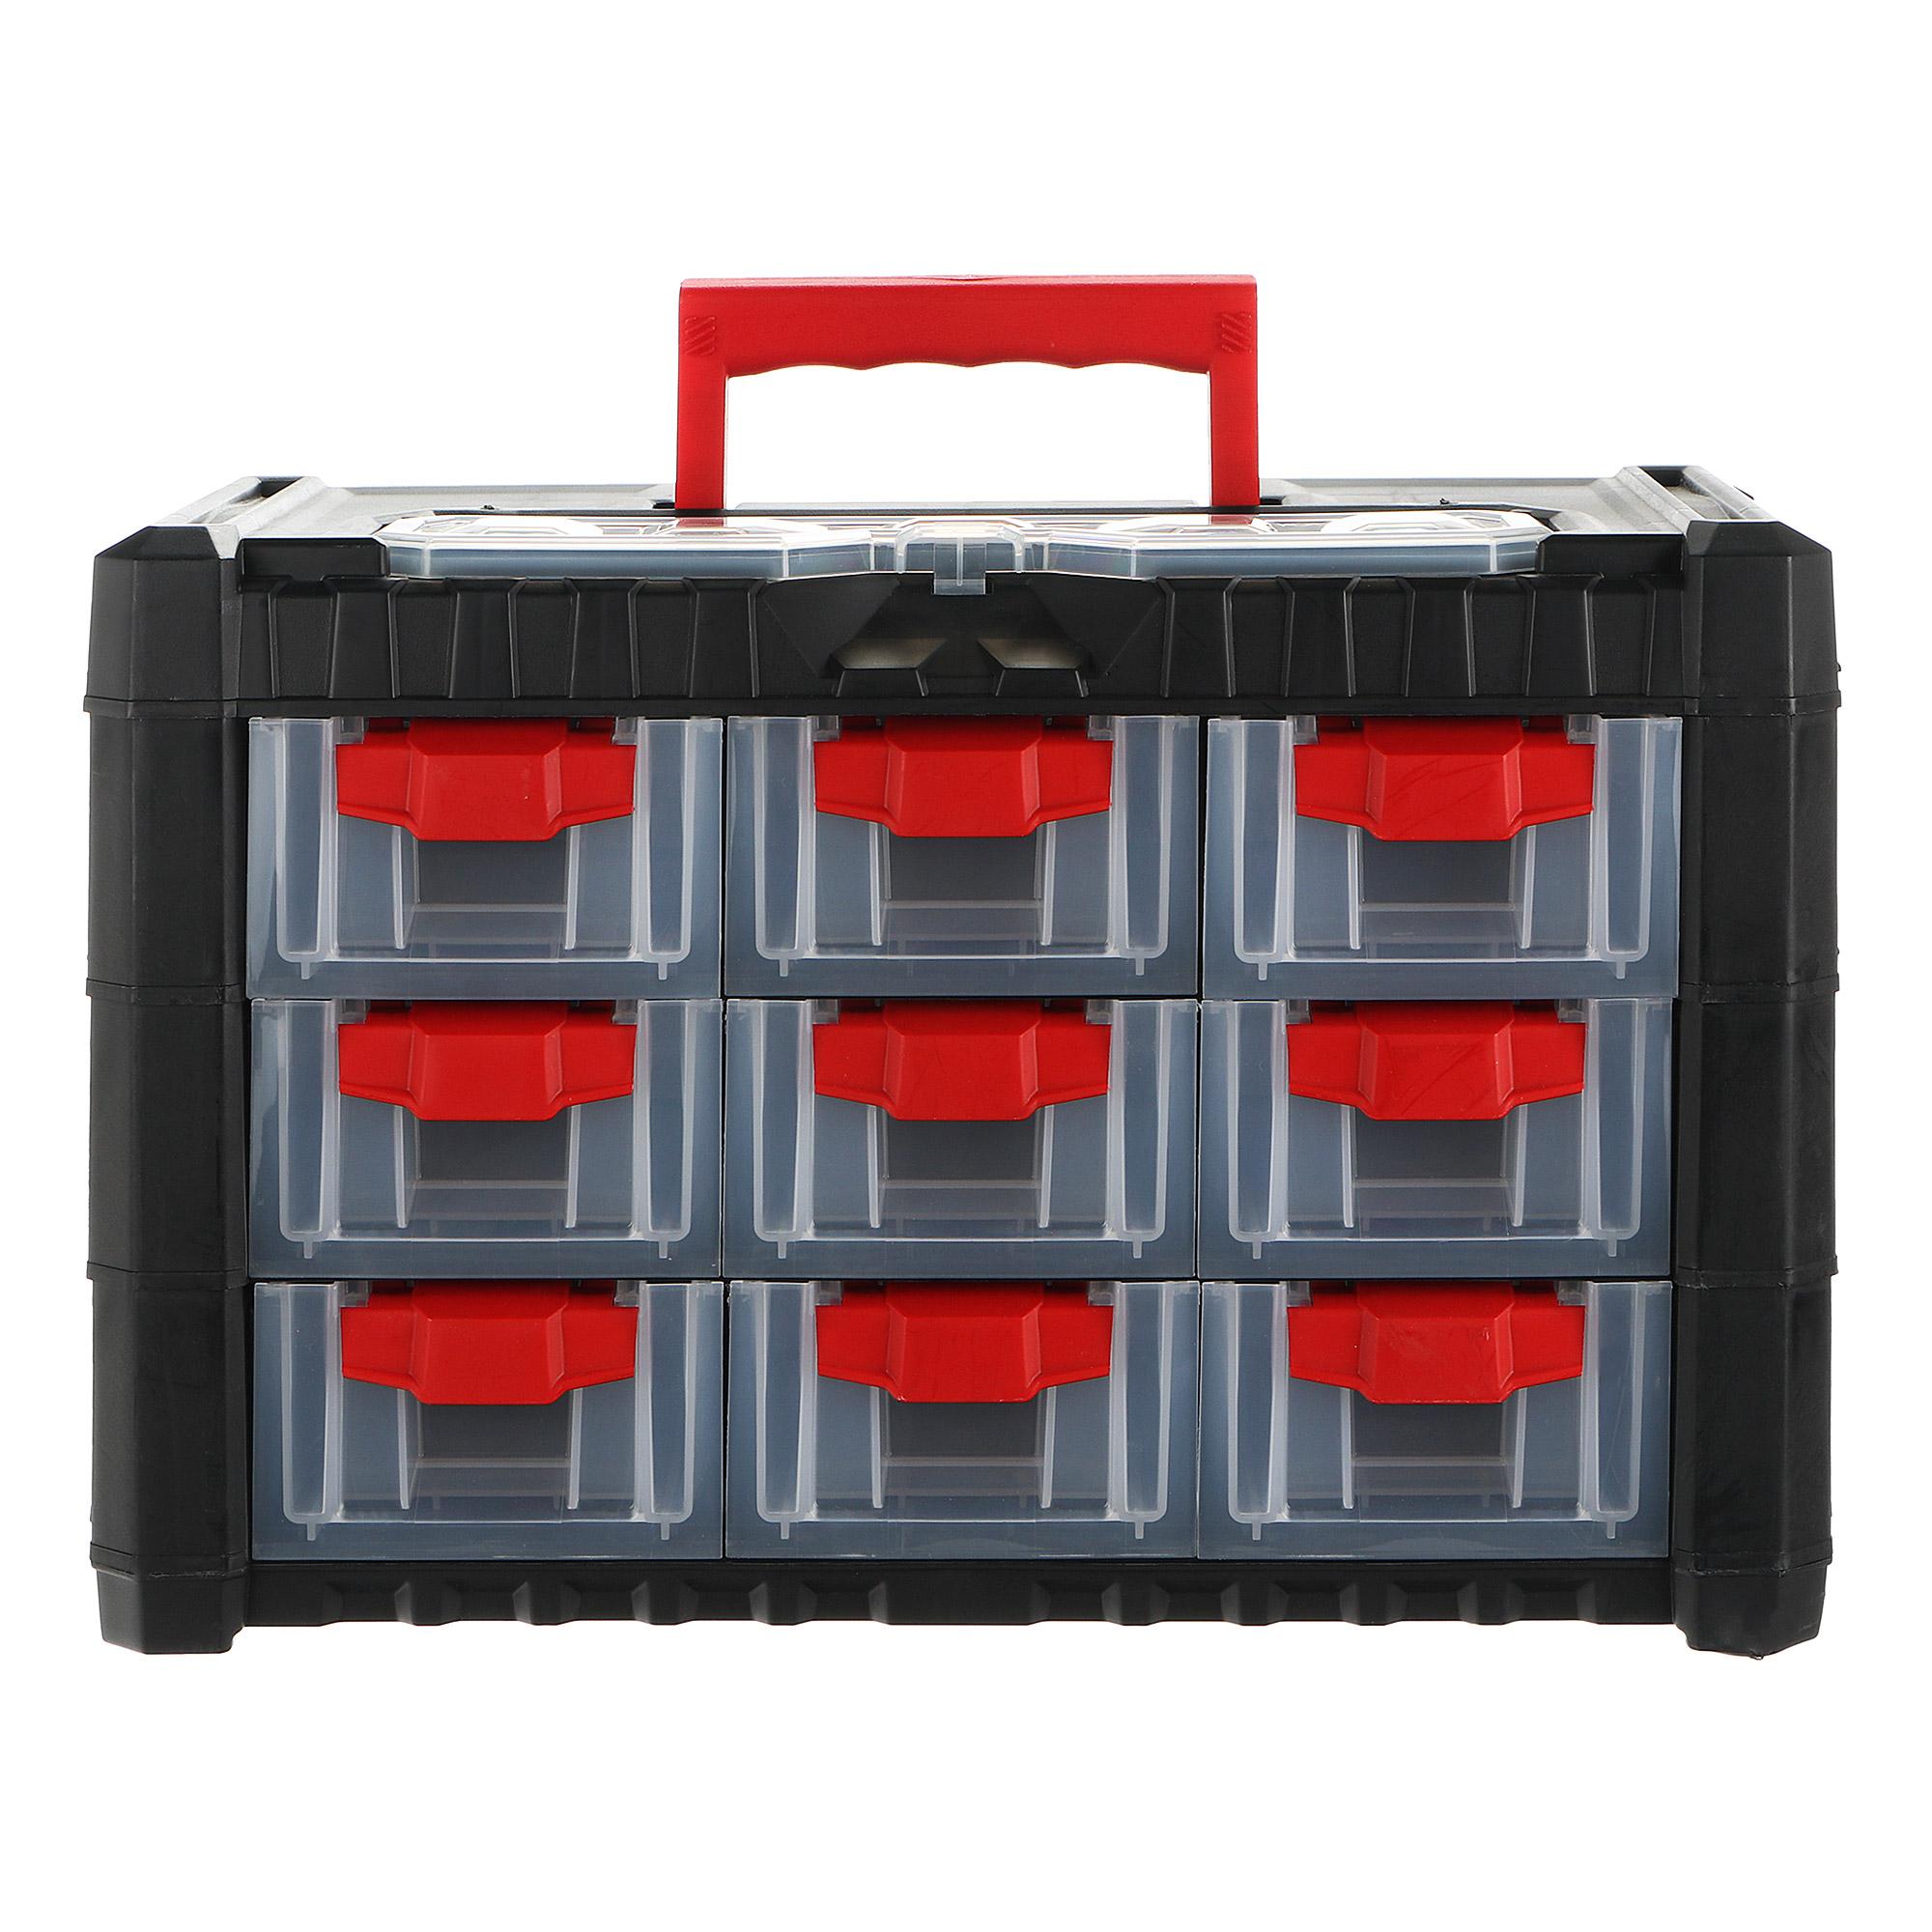 Система хранения Prosperplast multicase cargo